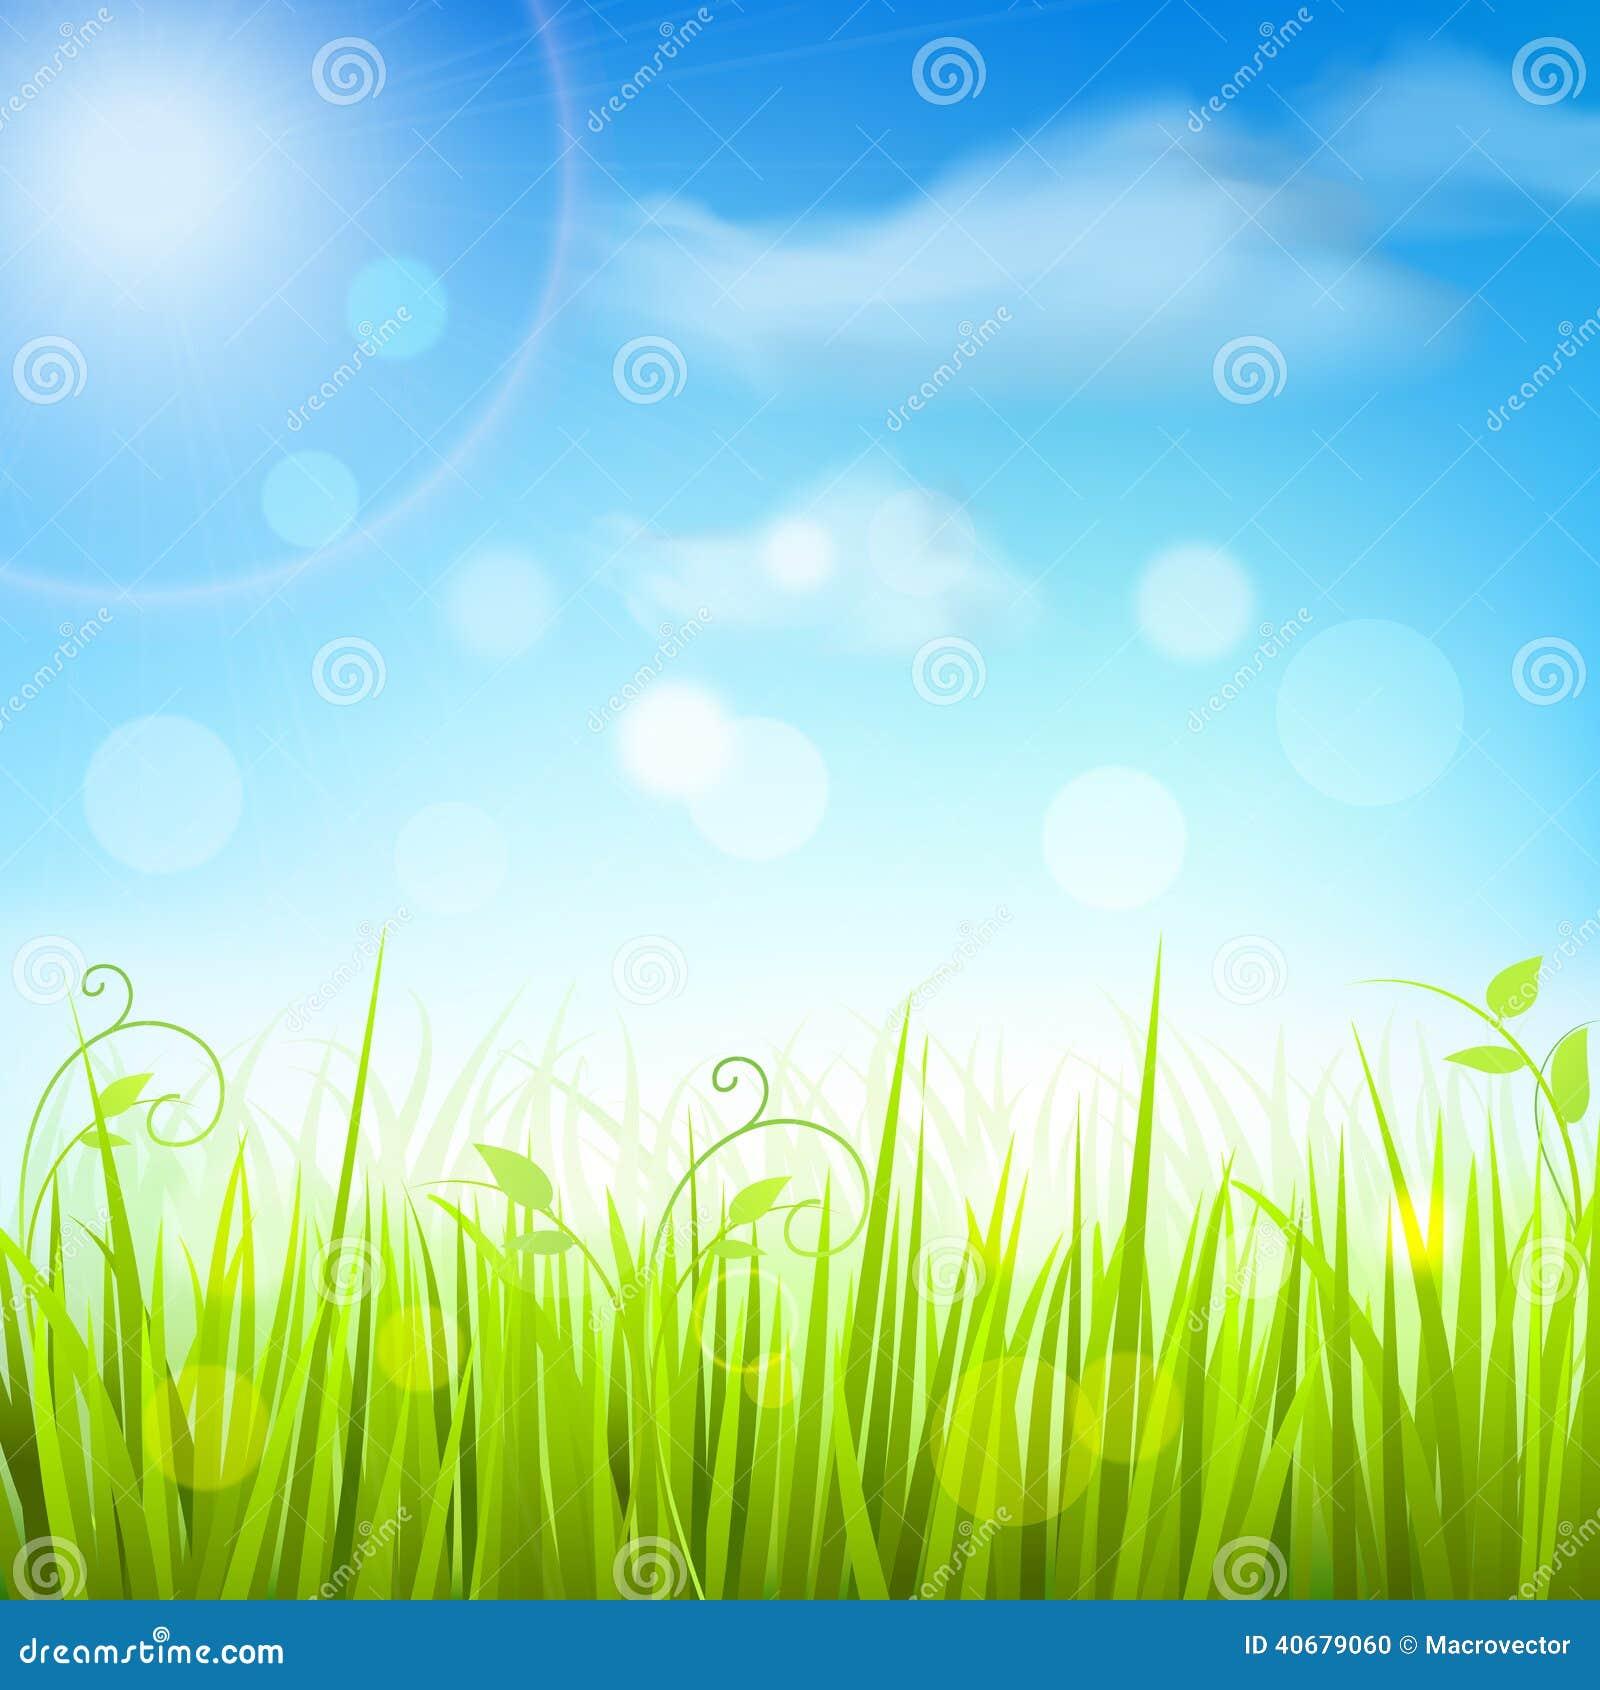 Church Floor Plan Spring Meadow Grass Blue Sky Poster Stock Vector Image